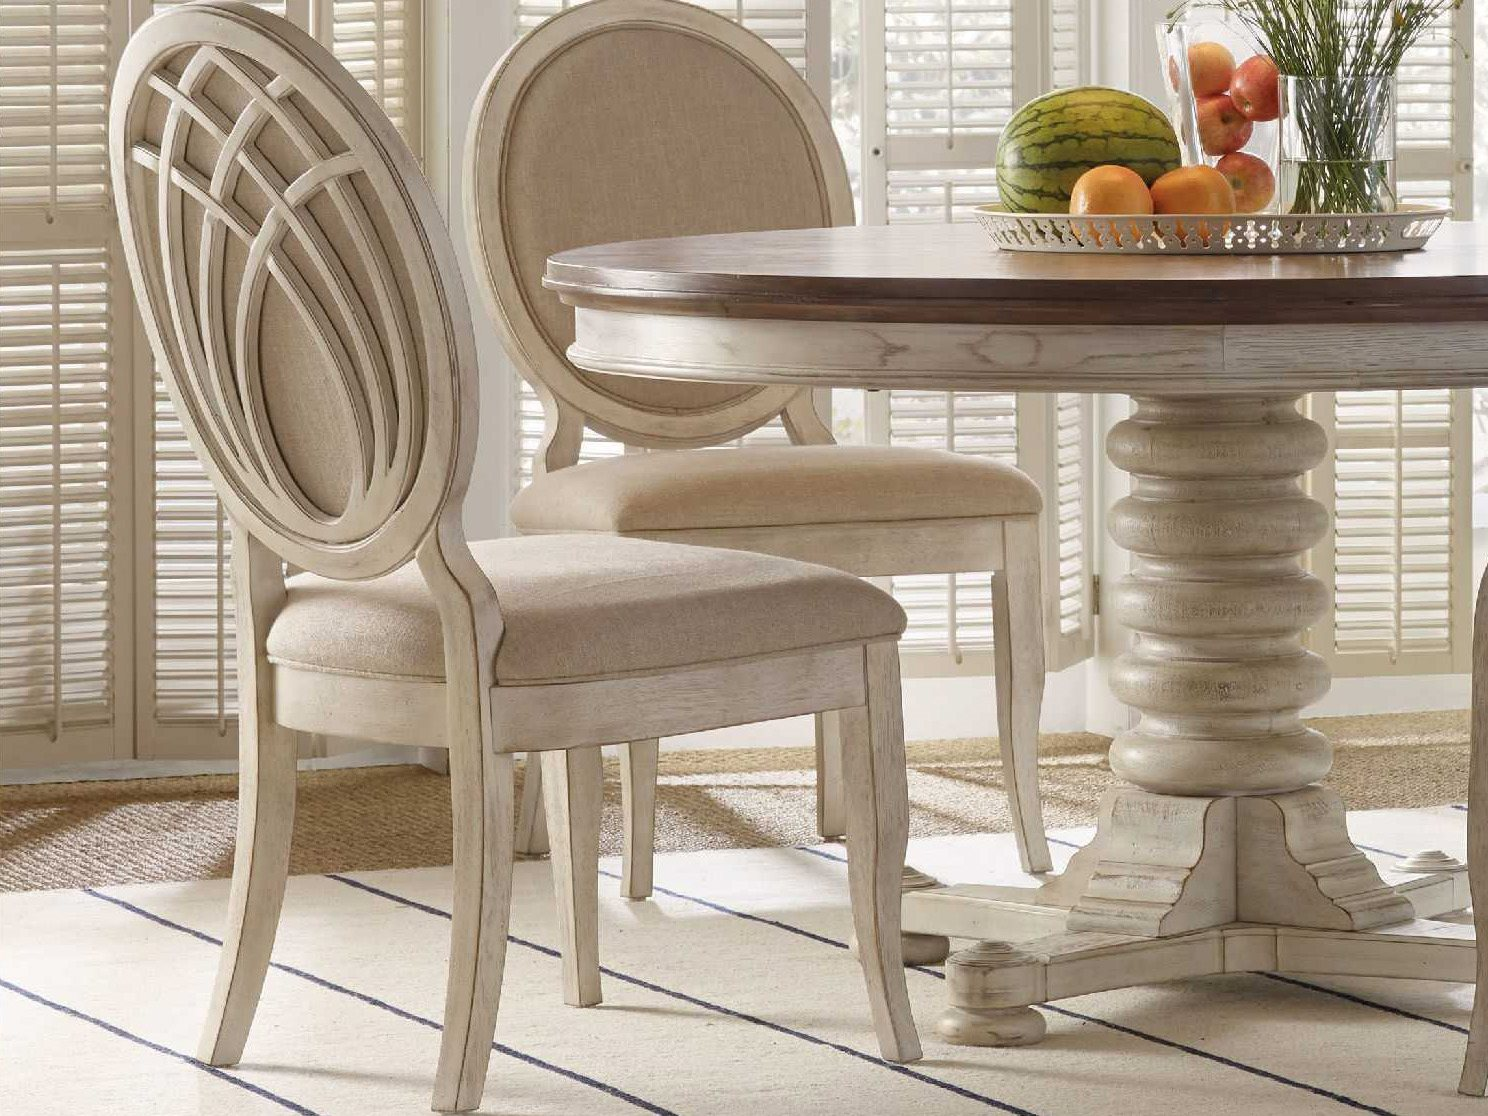 Excellent Hooker Furniture Sunset Point Lockram Linen White Dining Side Chair Machost Co Dining Chair Design Ideas Machostcouk